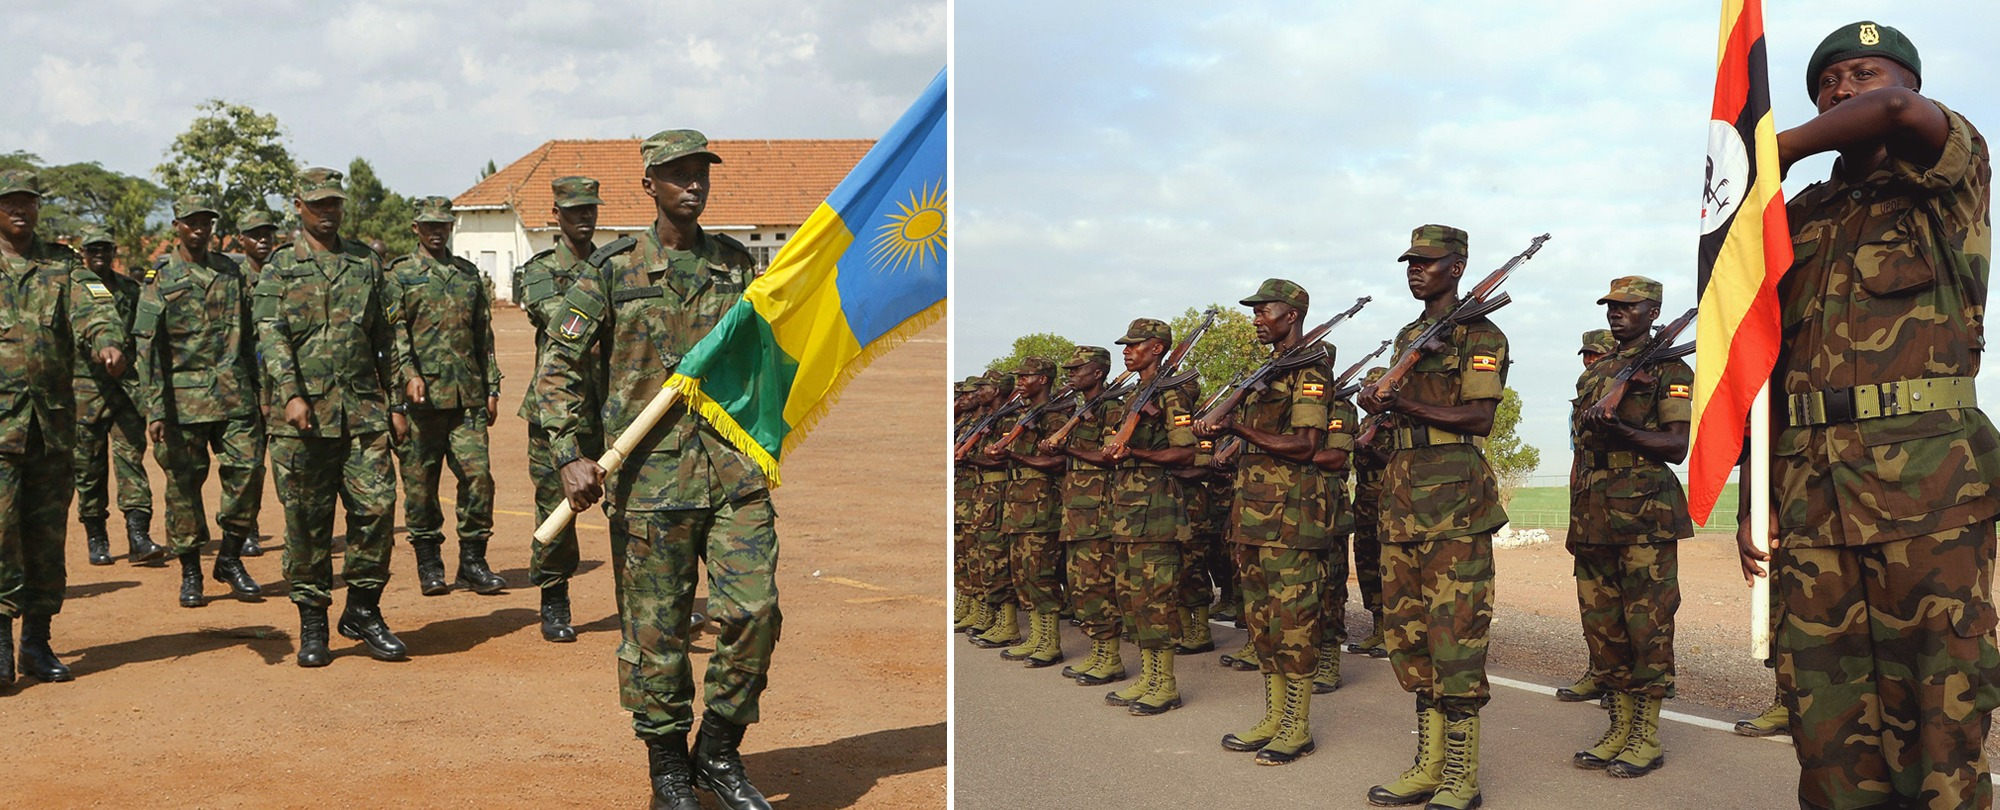 L'escalade des tensions entre l'Ouganda et le Rwanda suscite la crainte d'une guerre